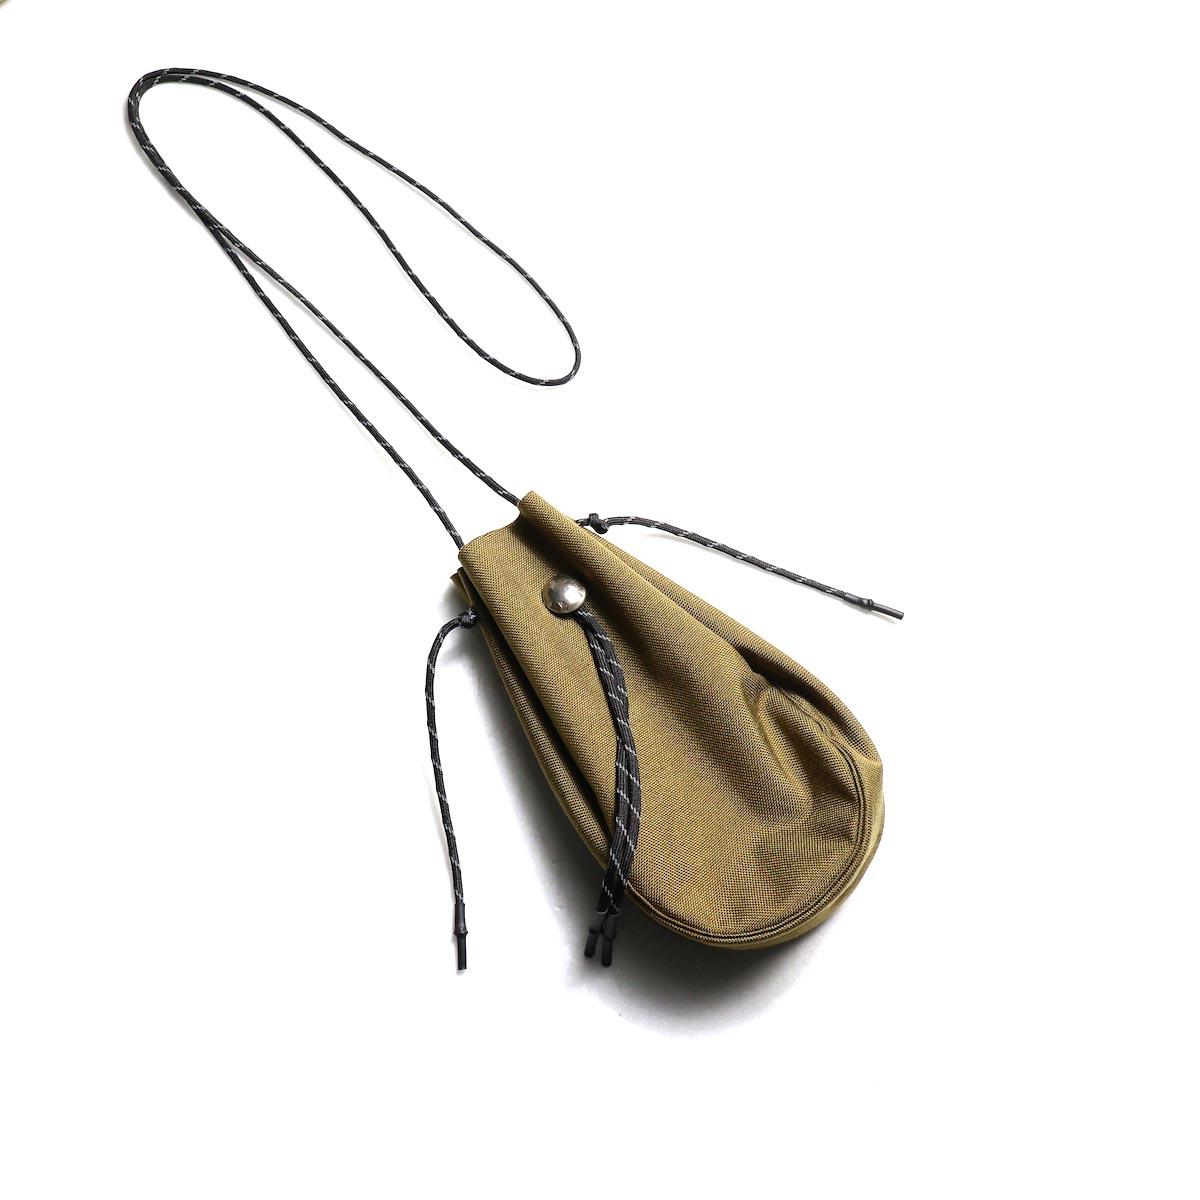 吉岡衣料店 / drawstring bag -S-. w/concho. (Coyote)